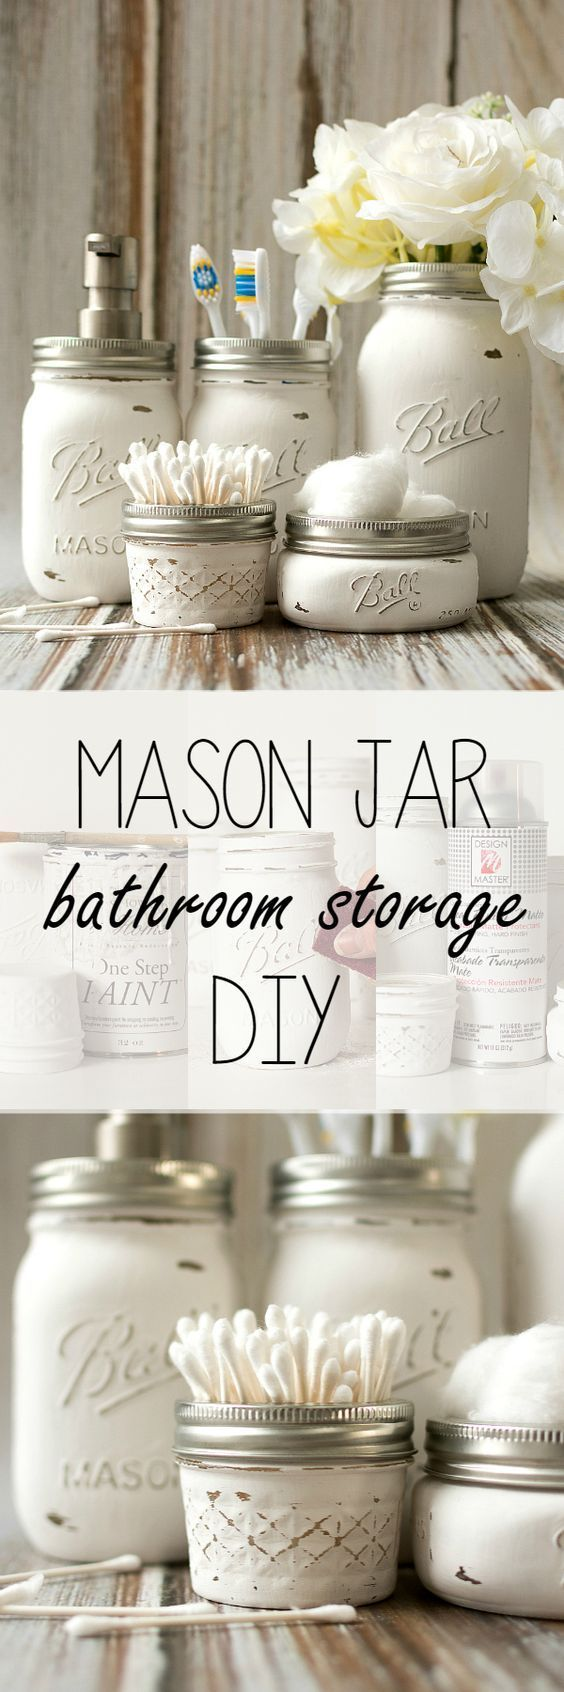 Mason Jar Bathroom Storage & Accessories | via http://masonjarcraftslove.com